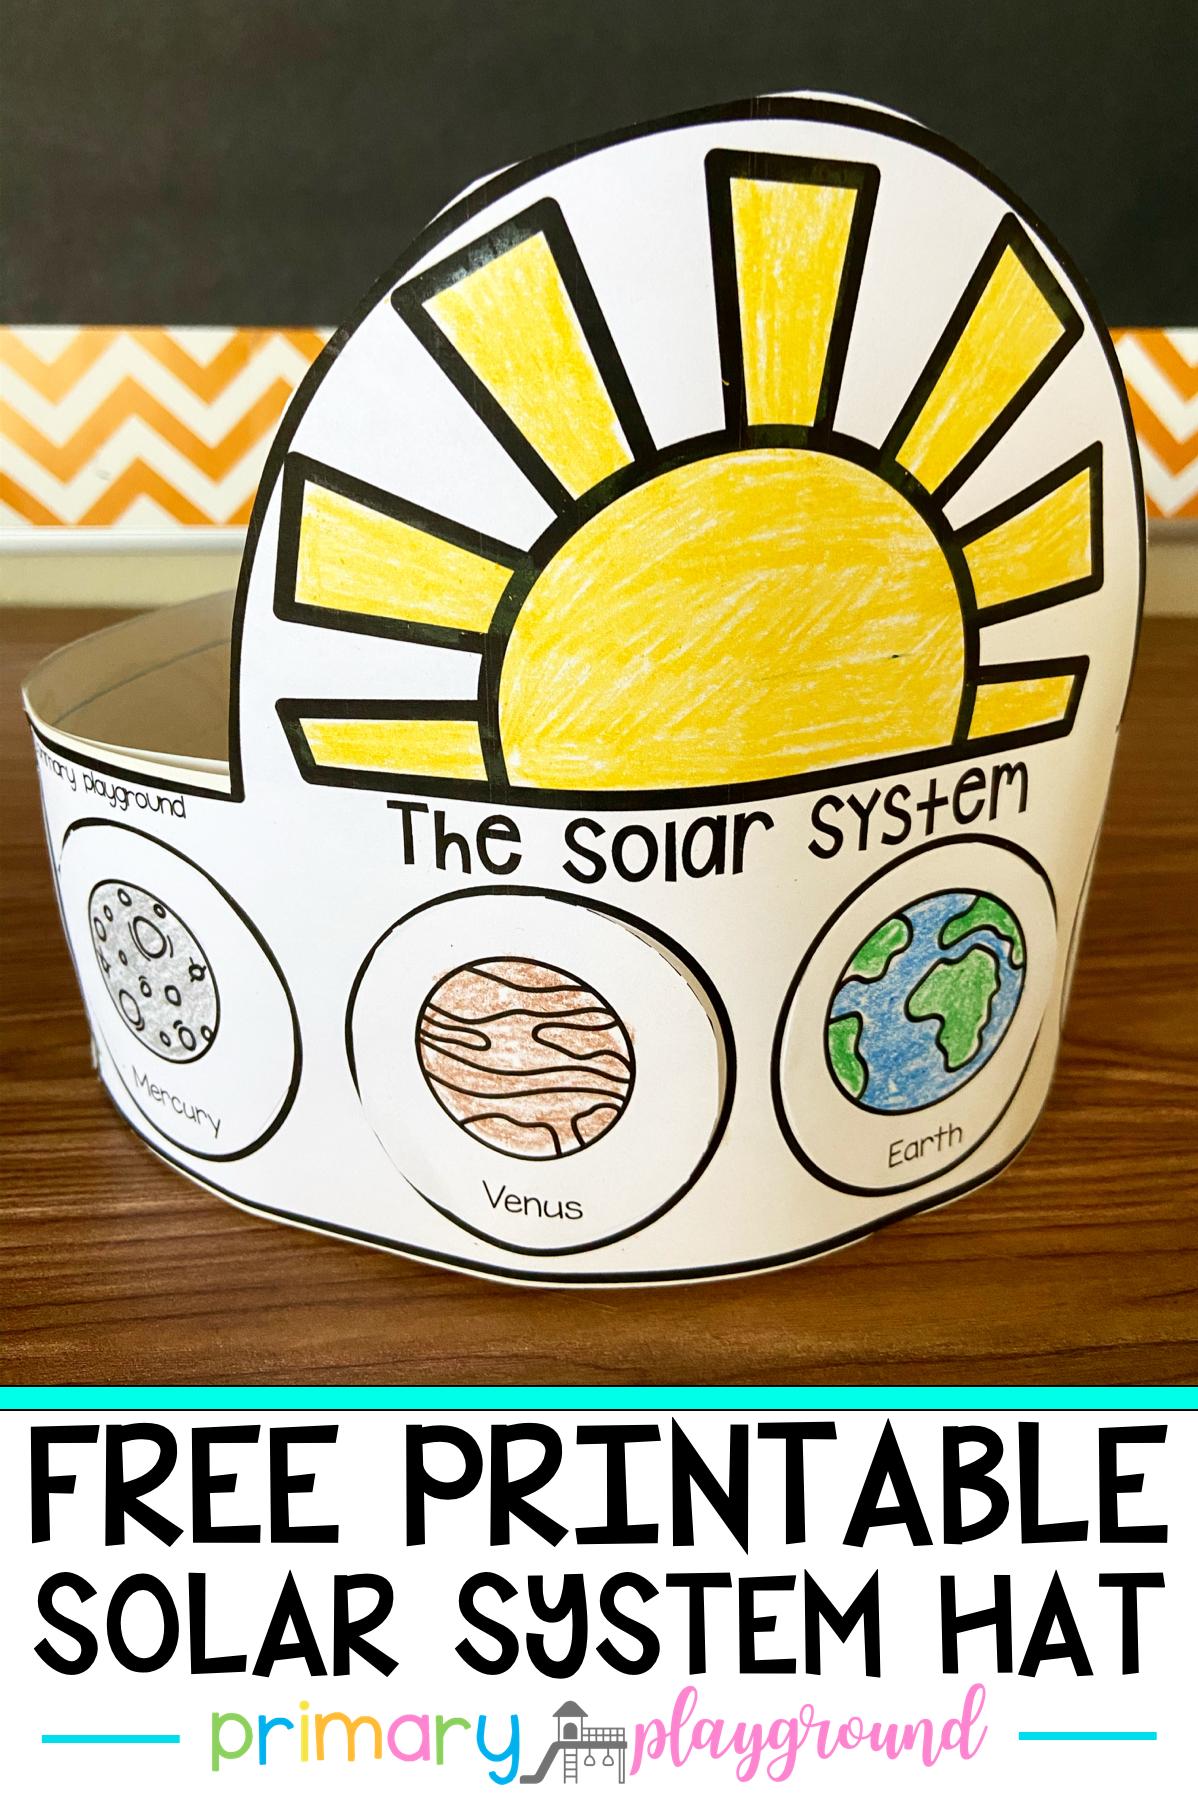 Free Printable Solar System Hat